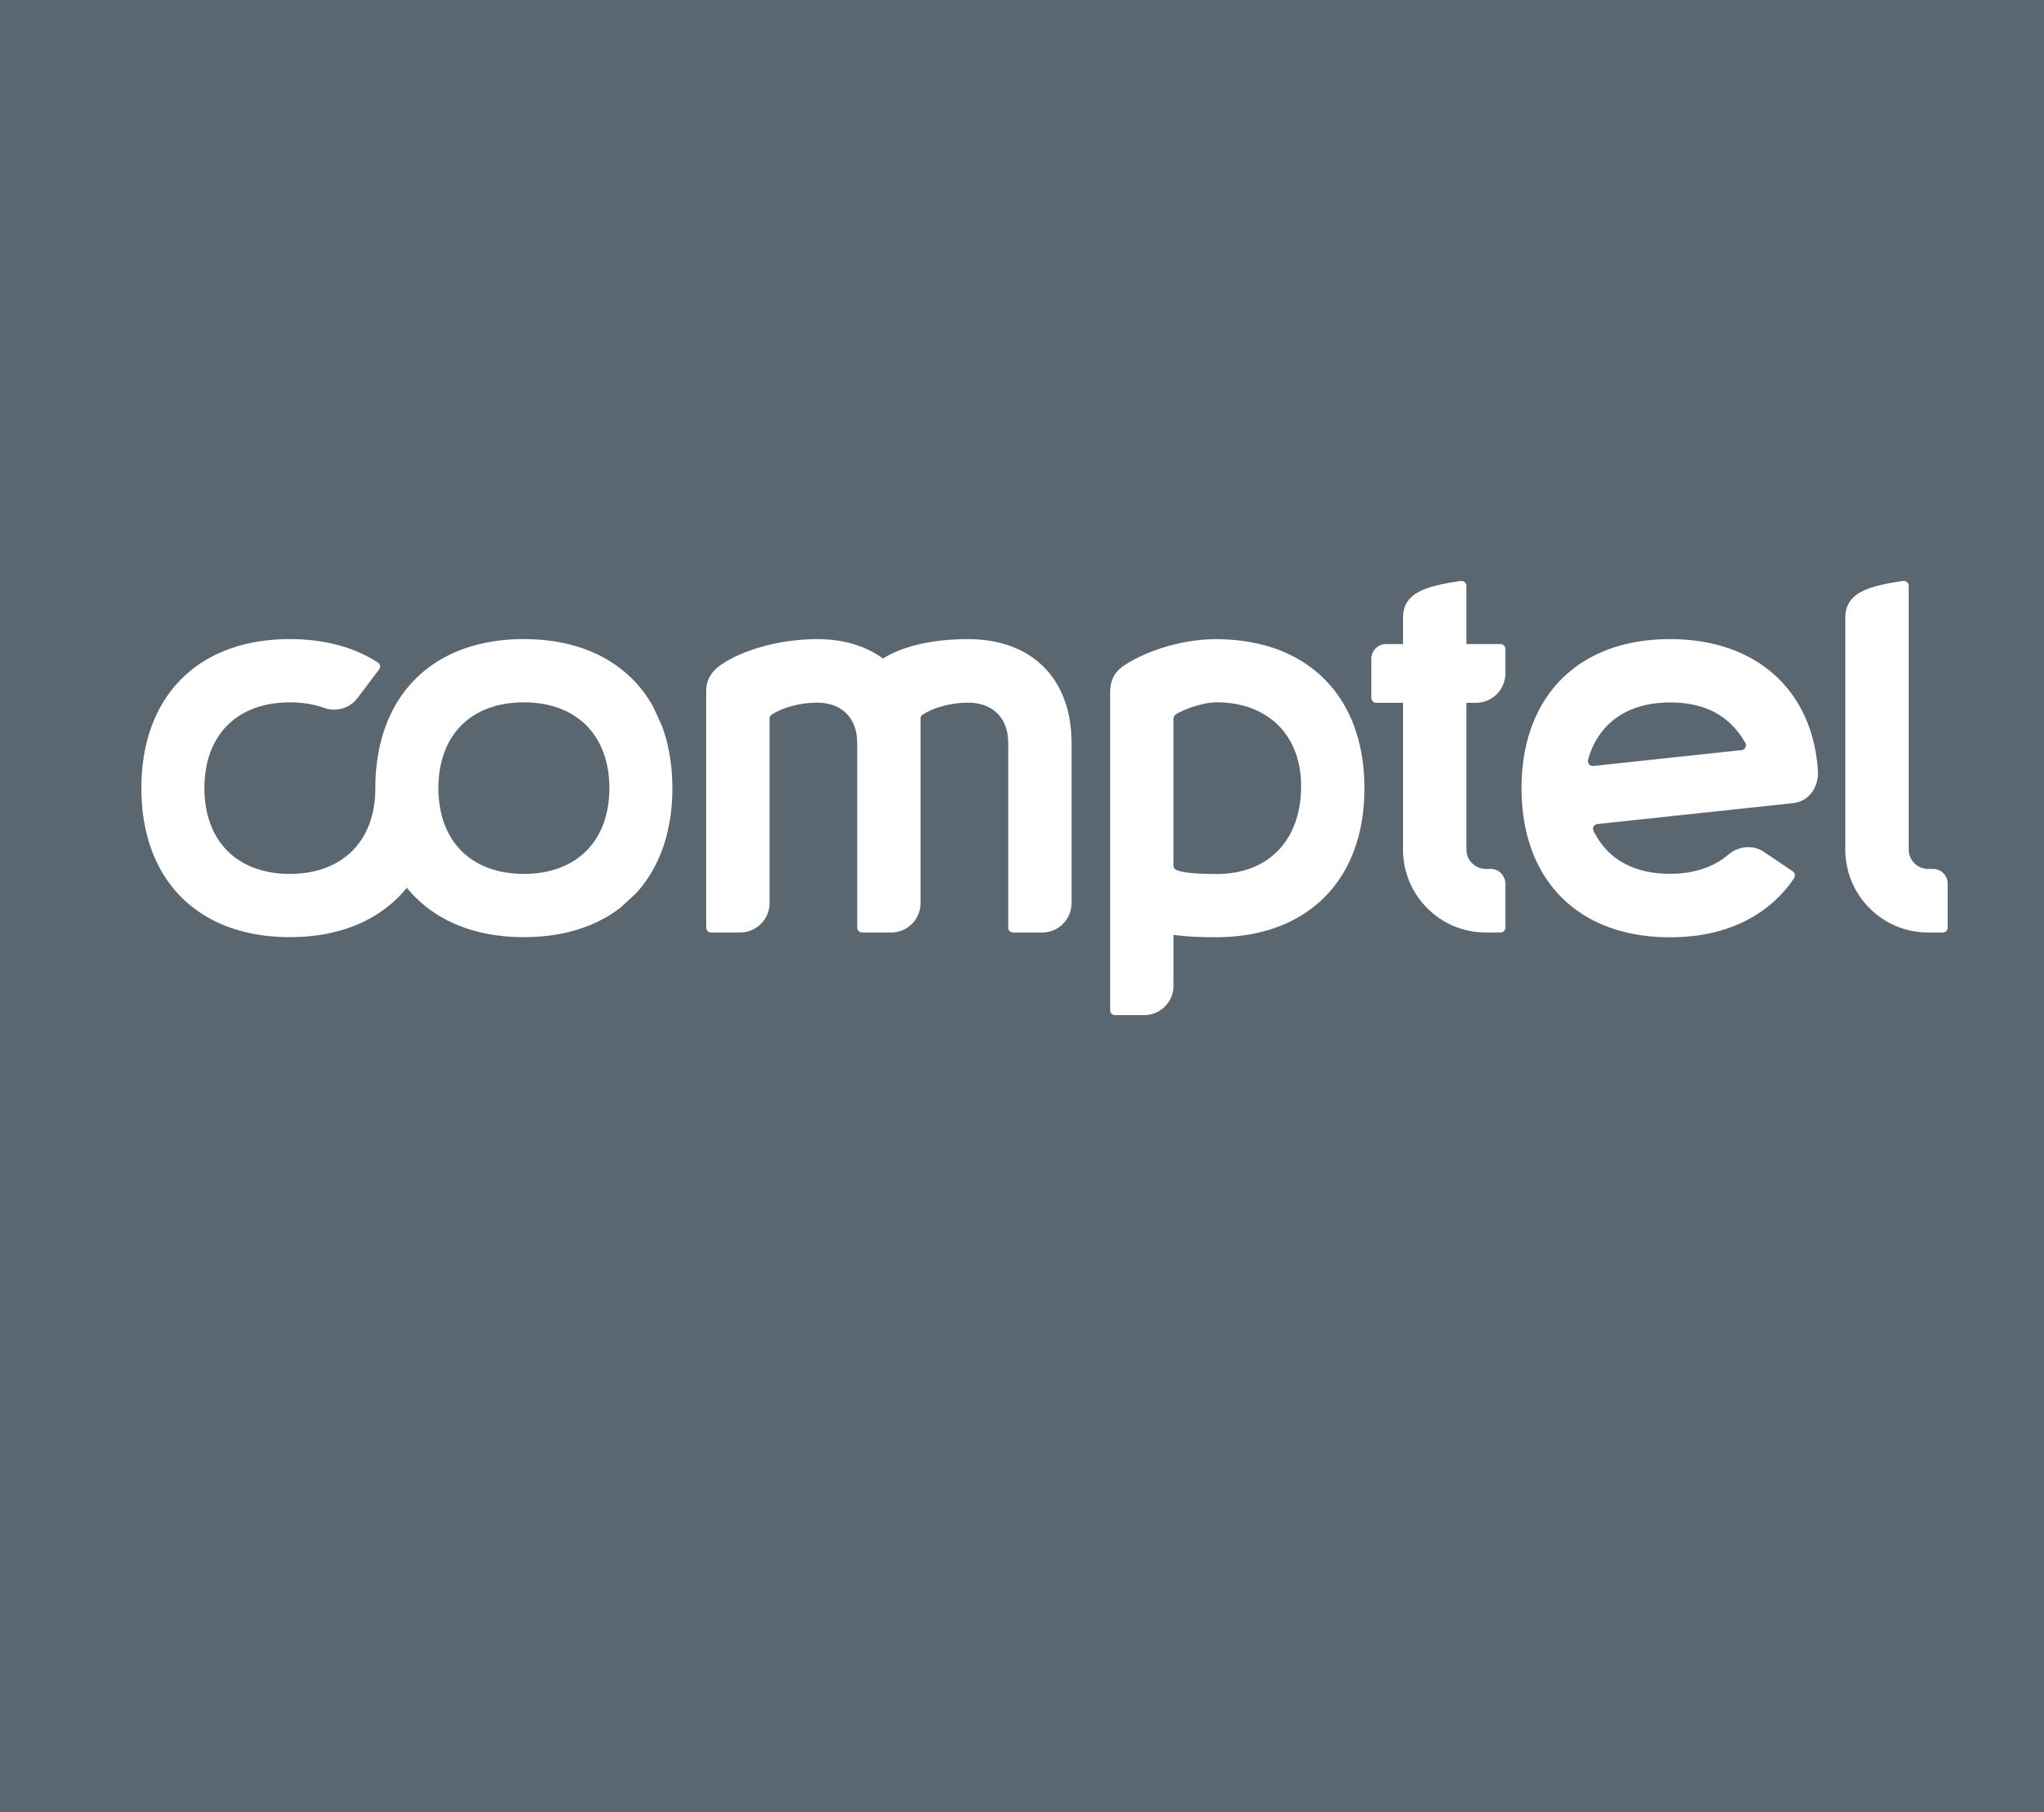 Nokia планируют приобрести Comptel за $370 млн